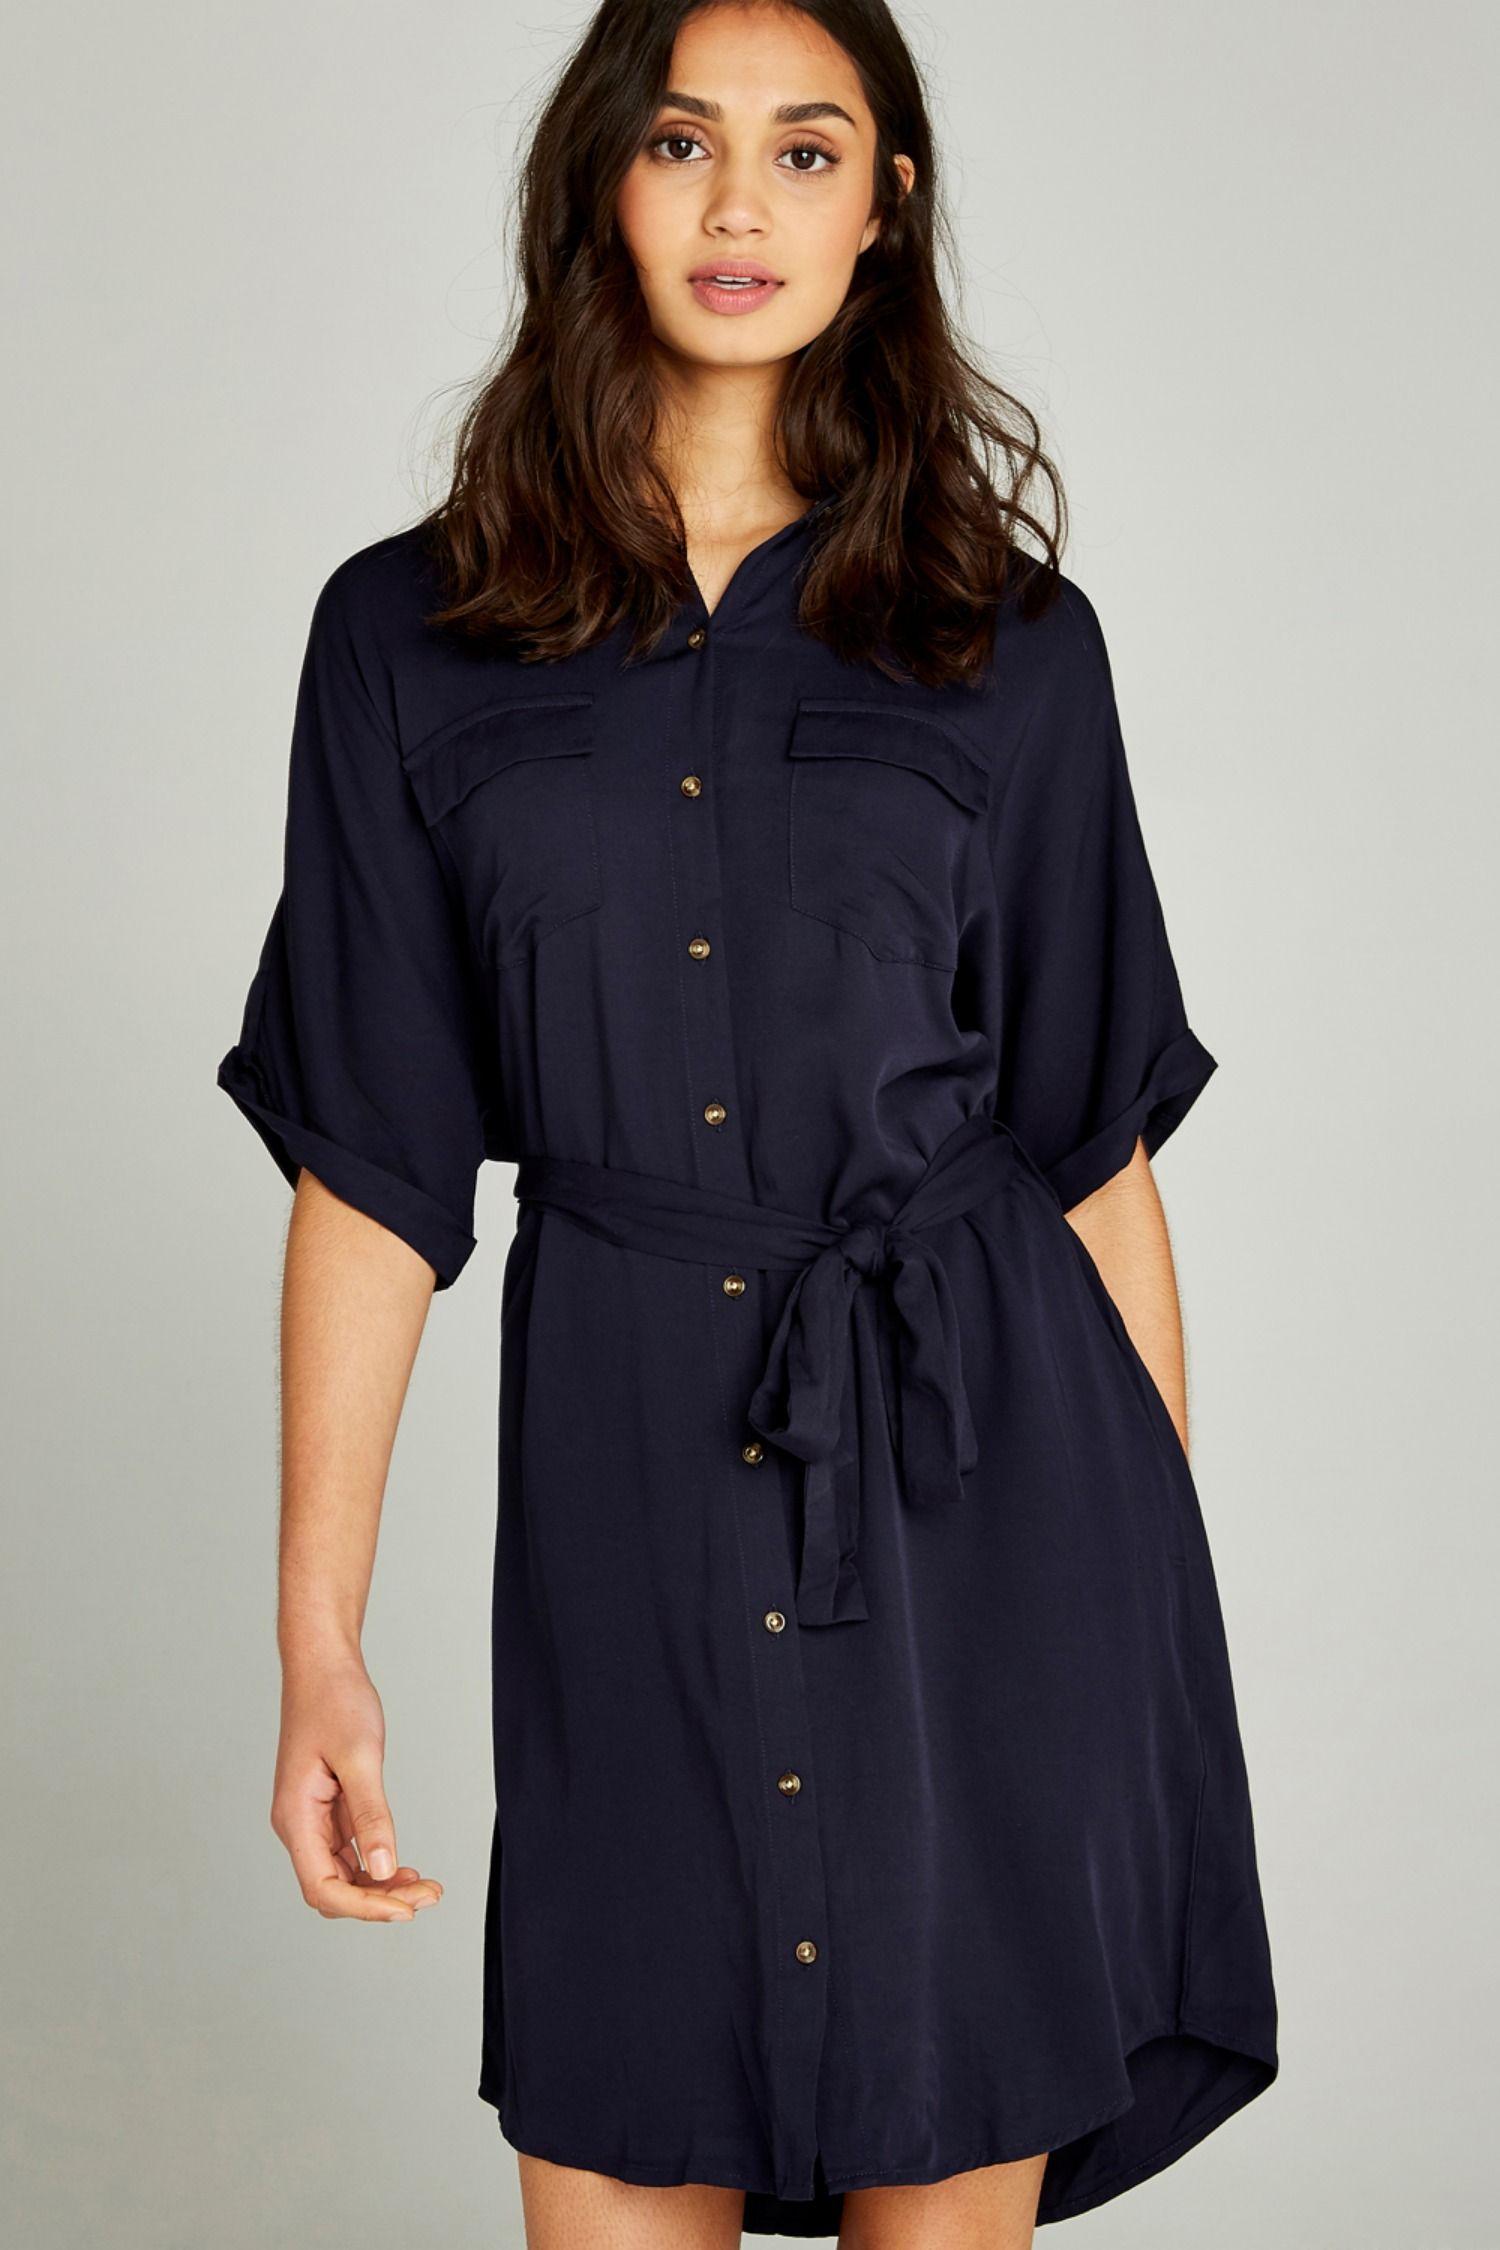 33f0b9c46d0dc NAVY BATWING SHIRT DRESS | SS19 | NEW SEASON | in 2019 | Dresses ...